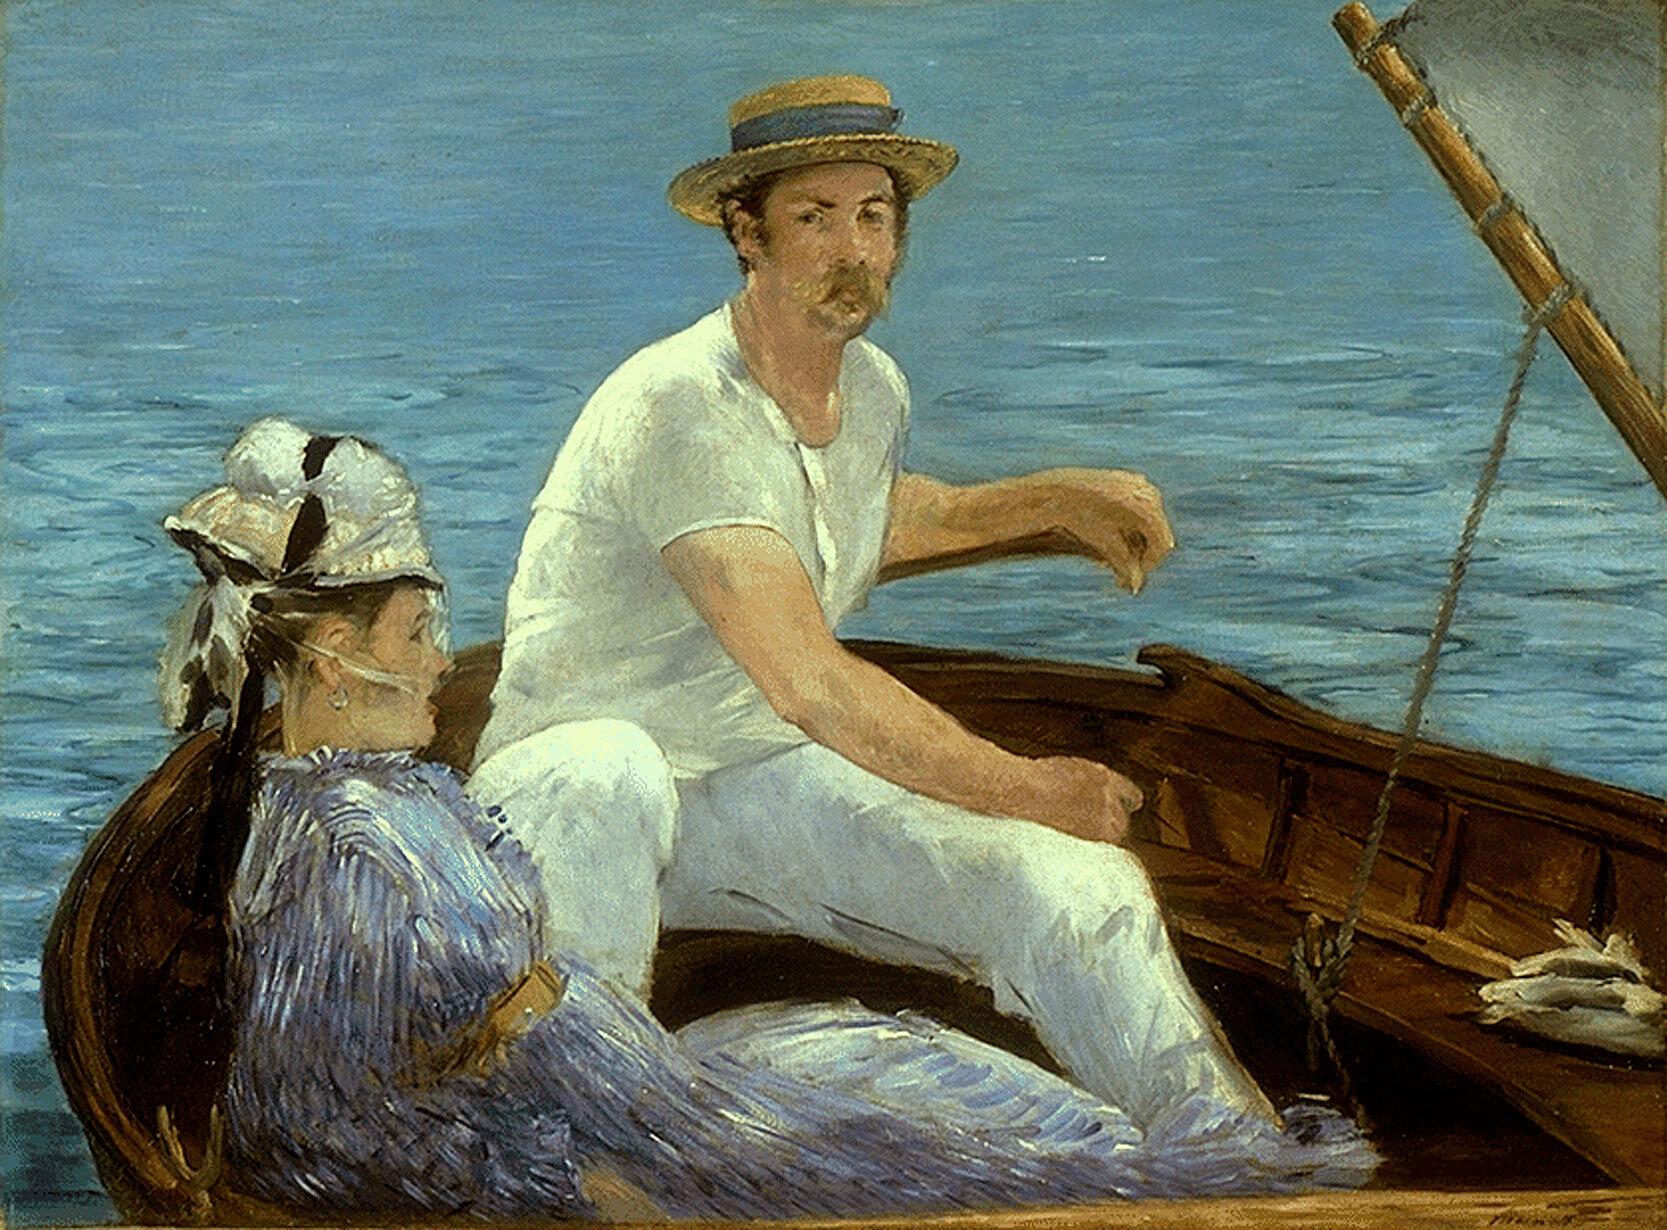 Boating, (1874) by Edouard Manet